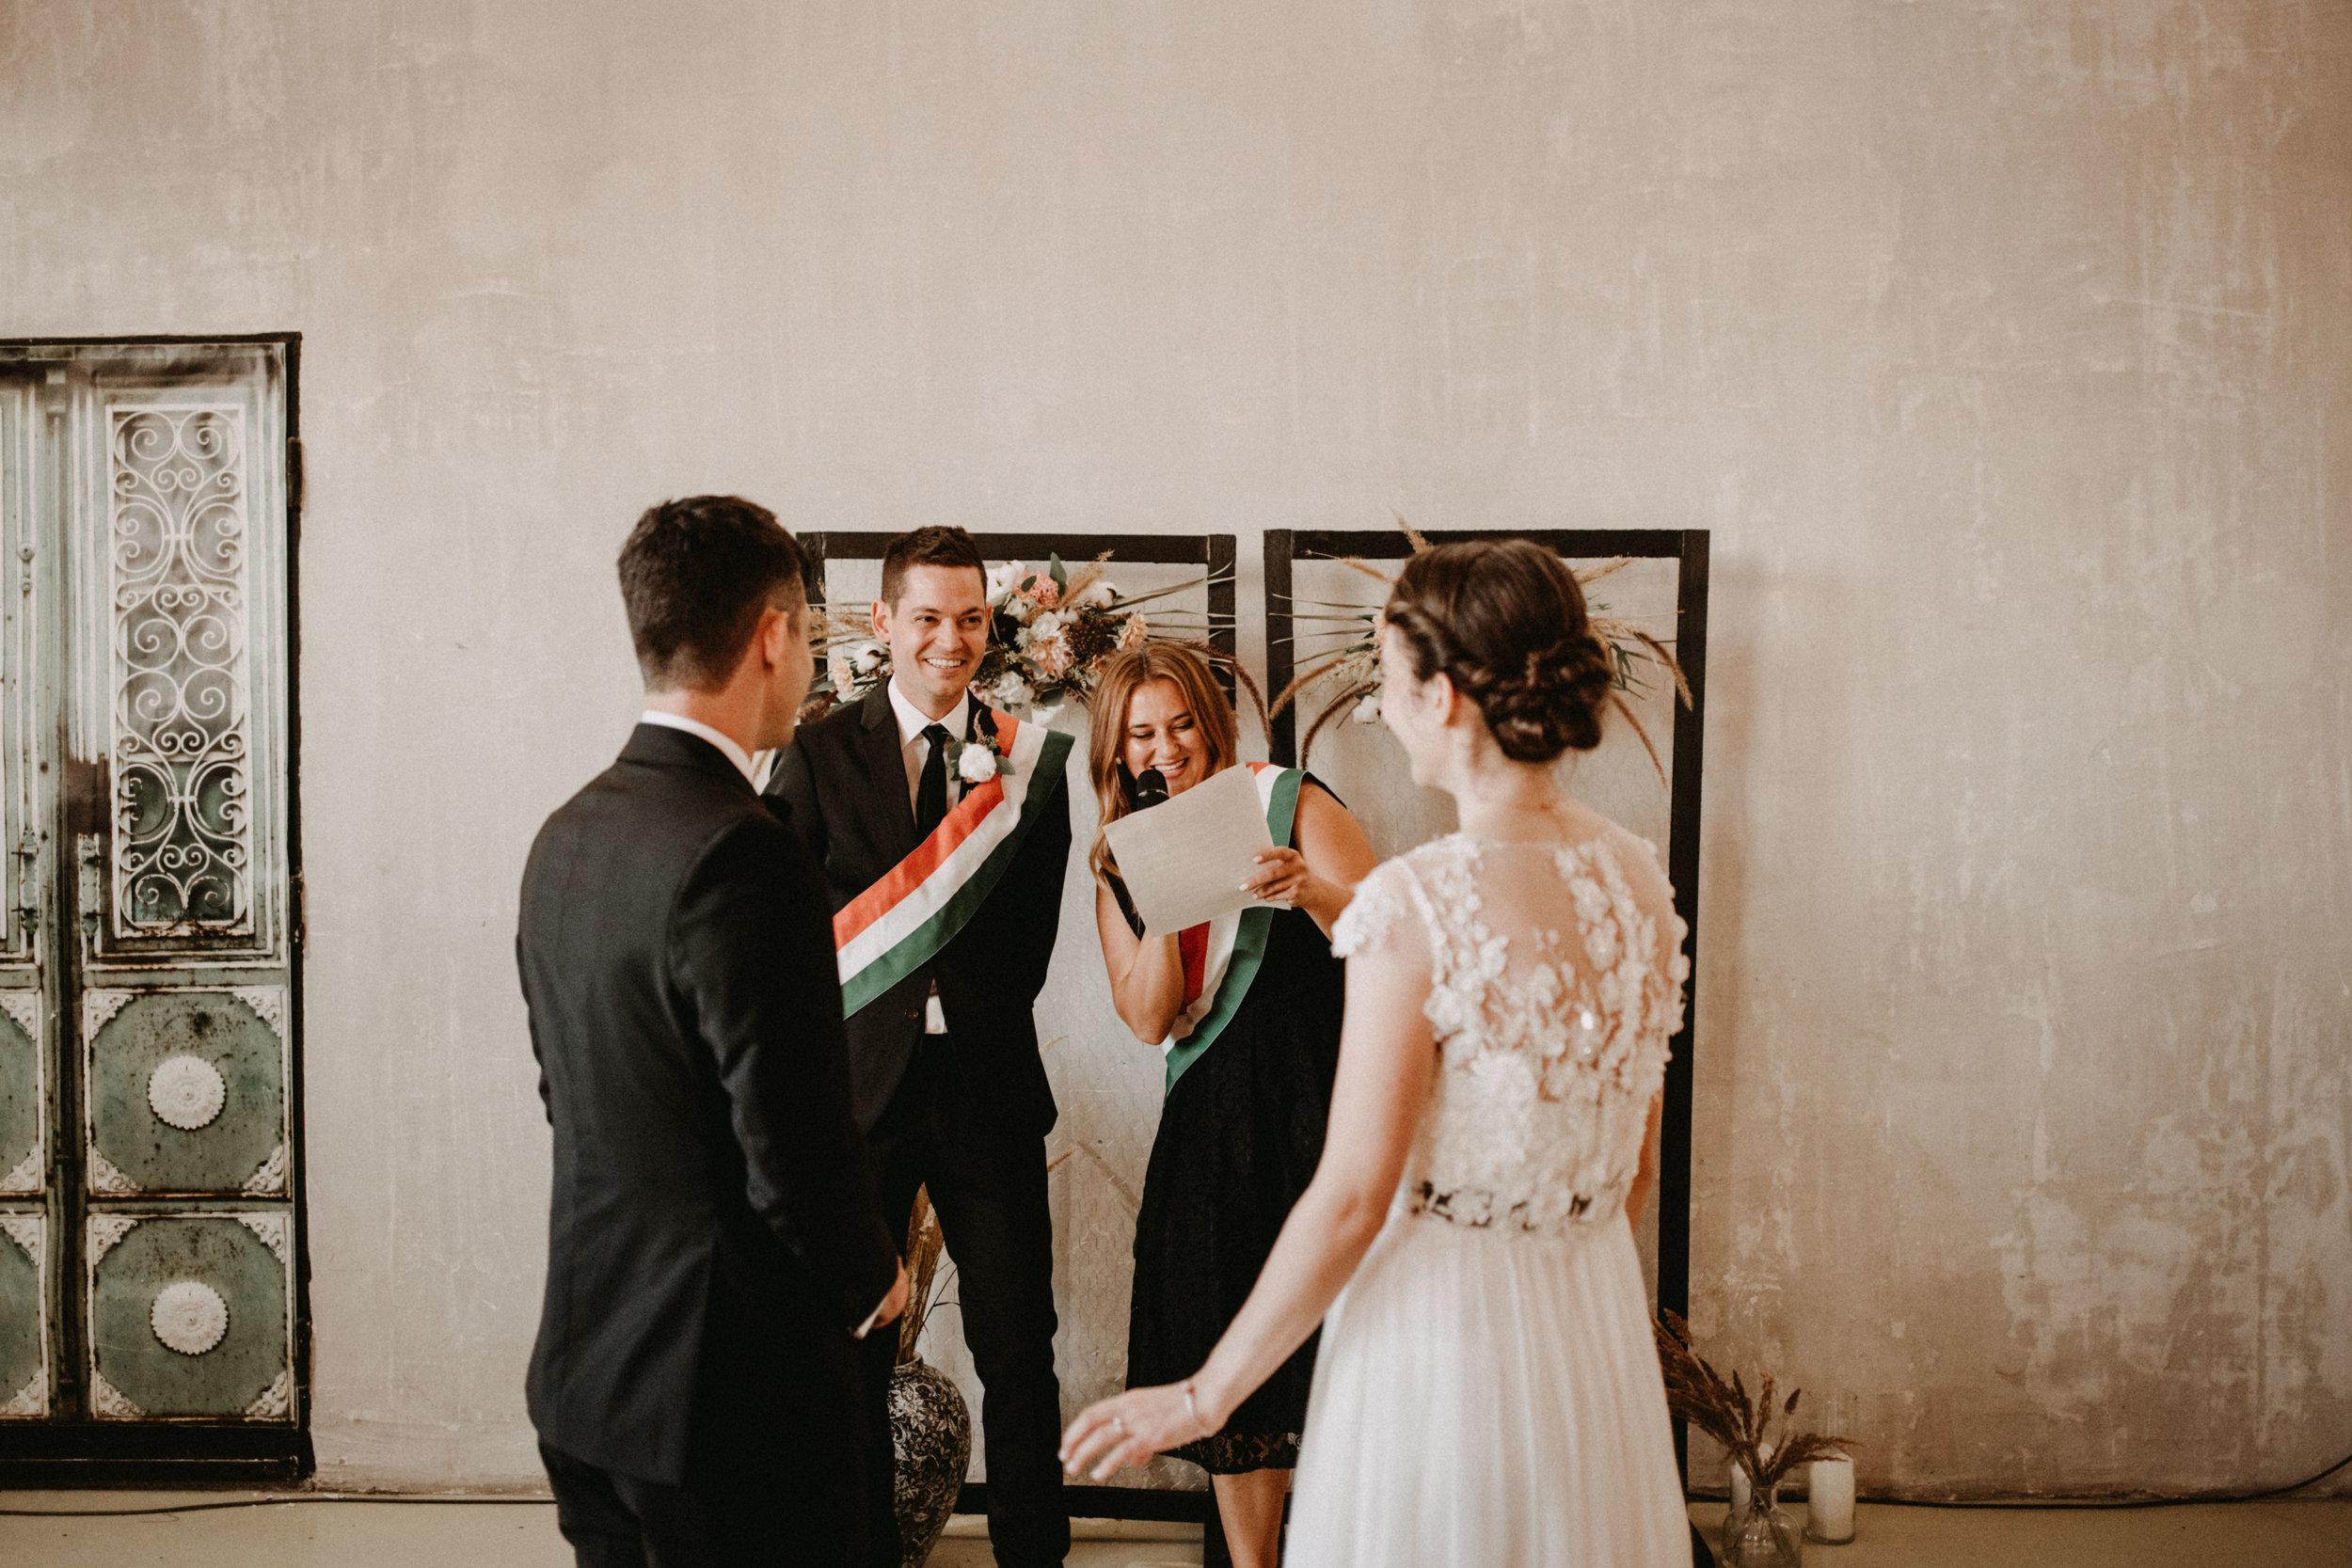 1826-Moni+Szabi-wedding-435-w.jpg